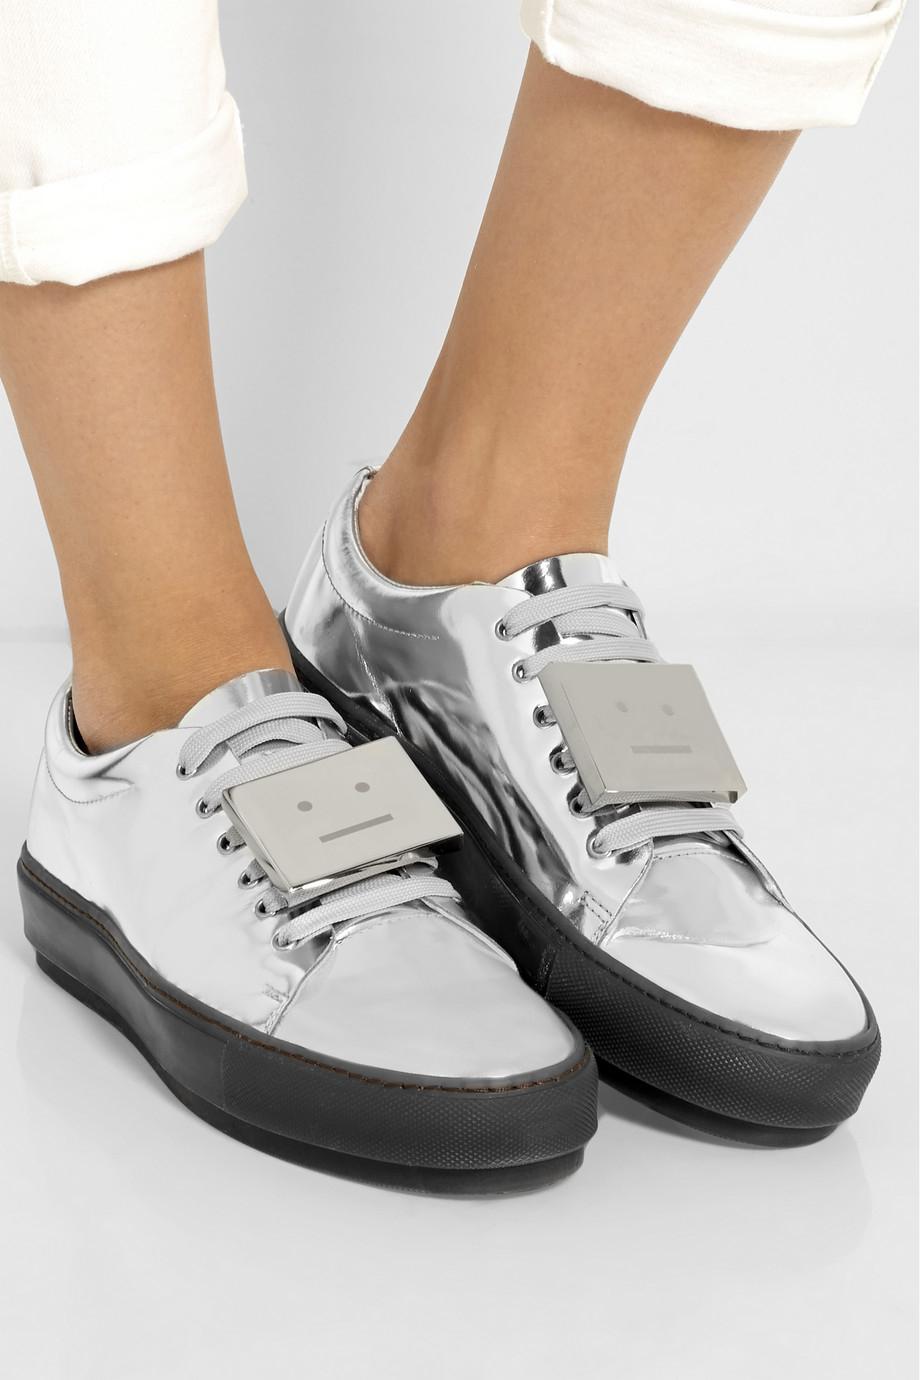 Acne Shoes Uk